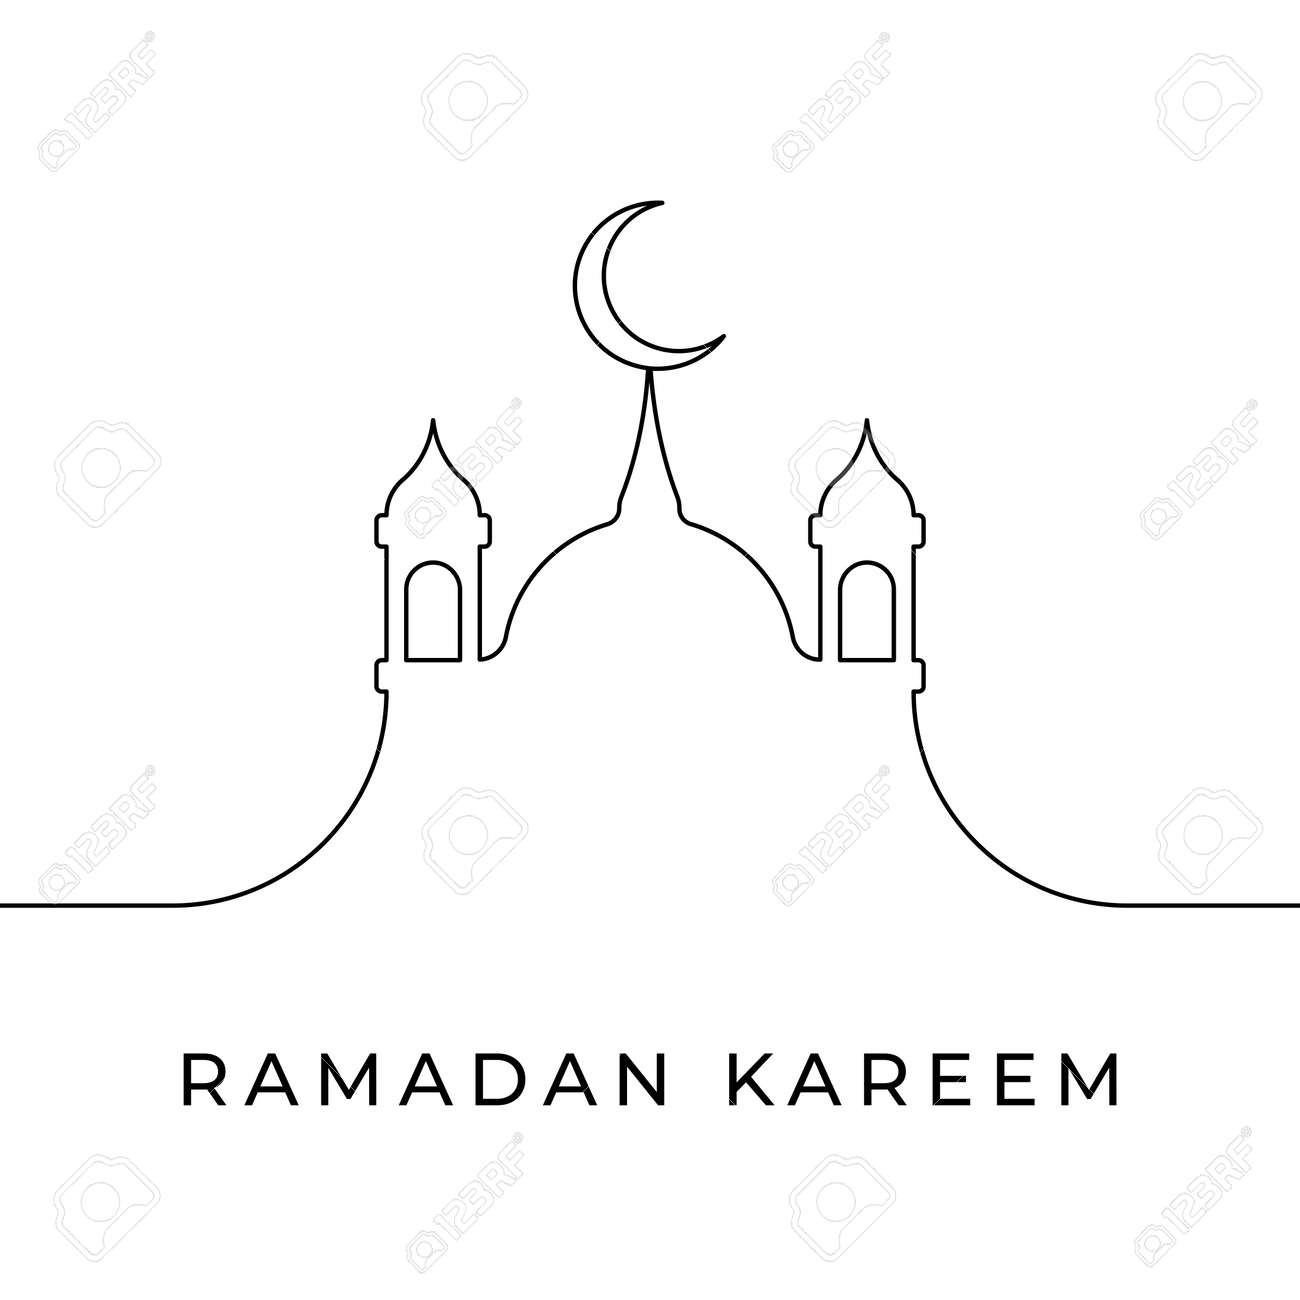 Elegant ramadan kareem decorative festival card - 168786262